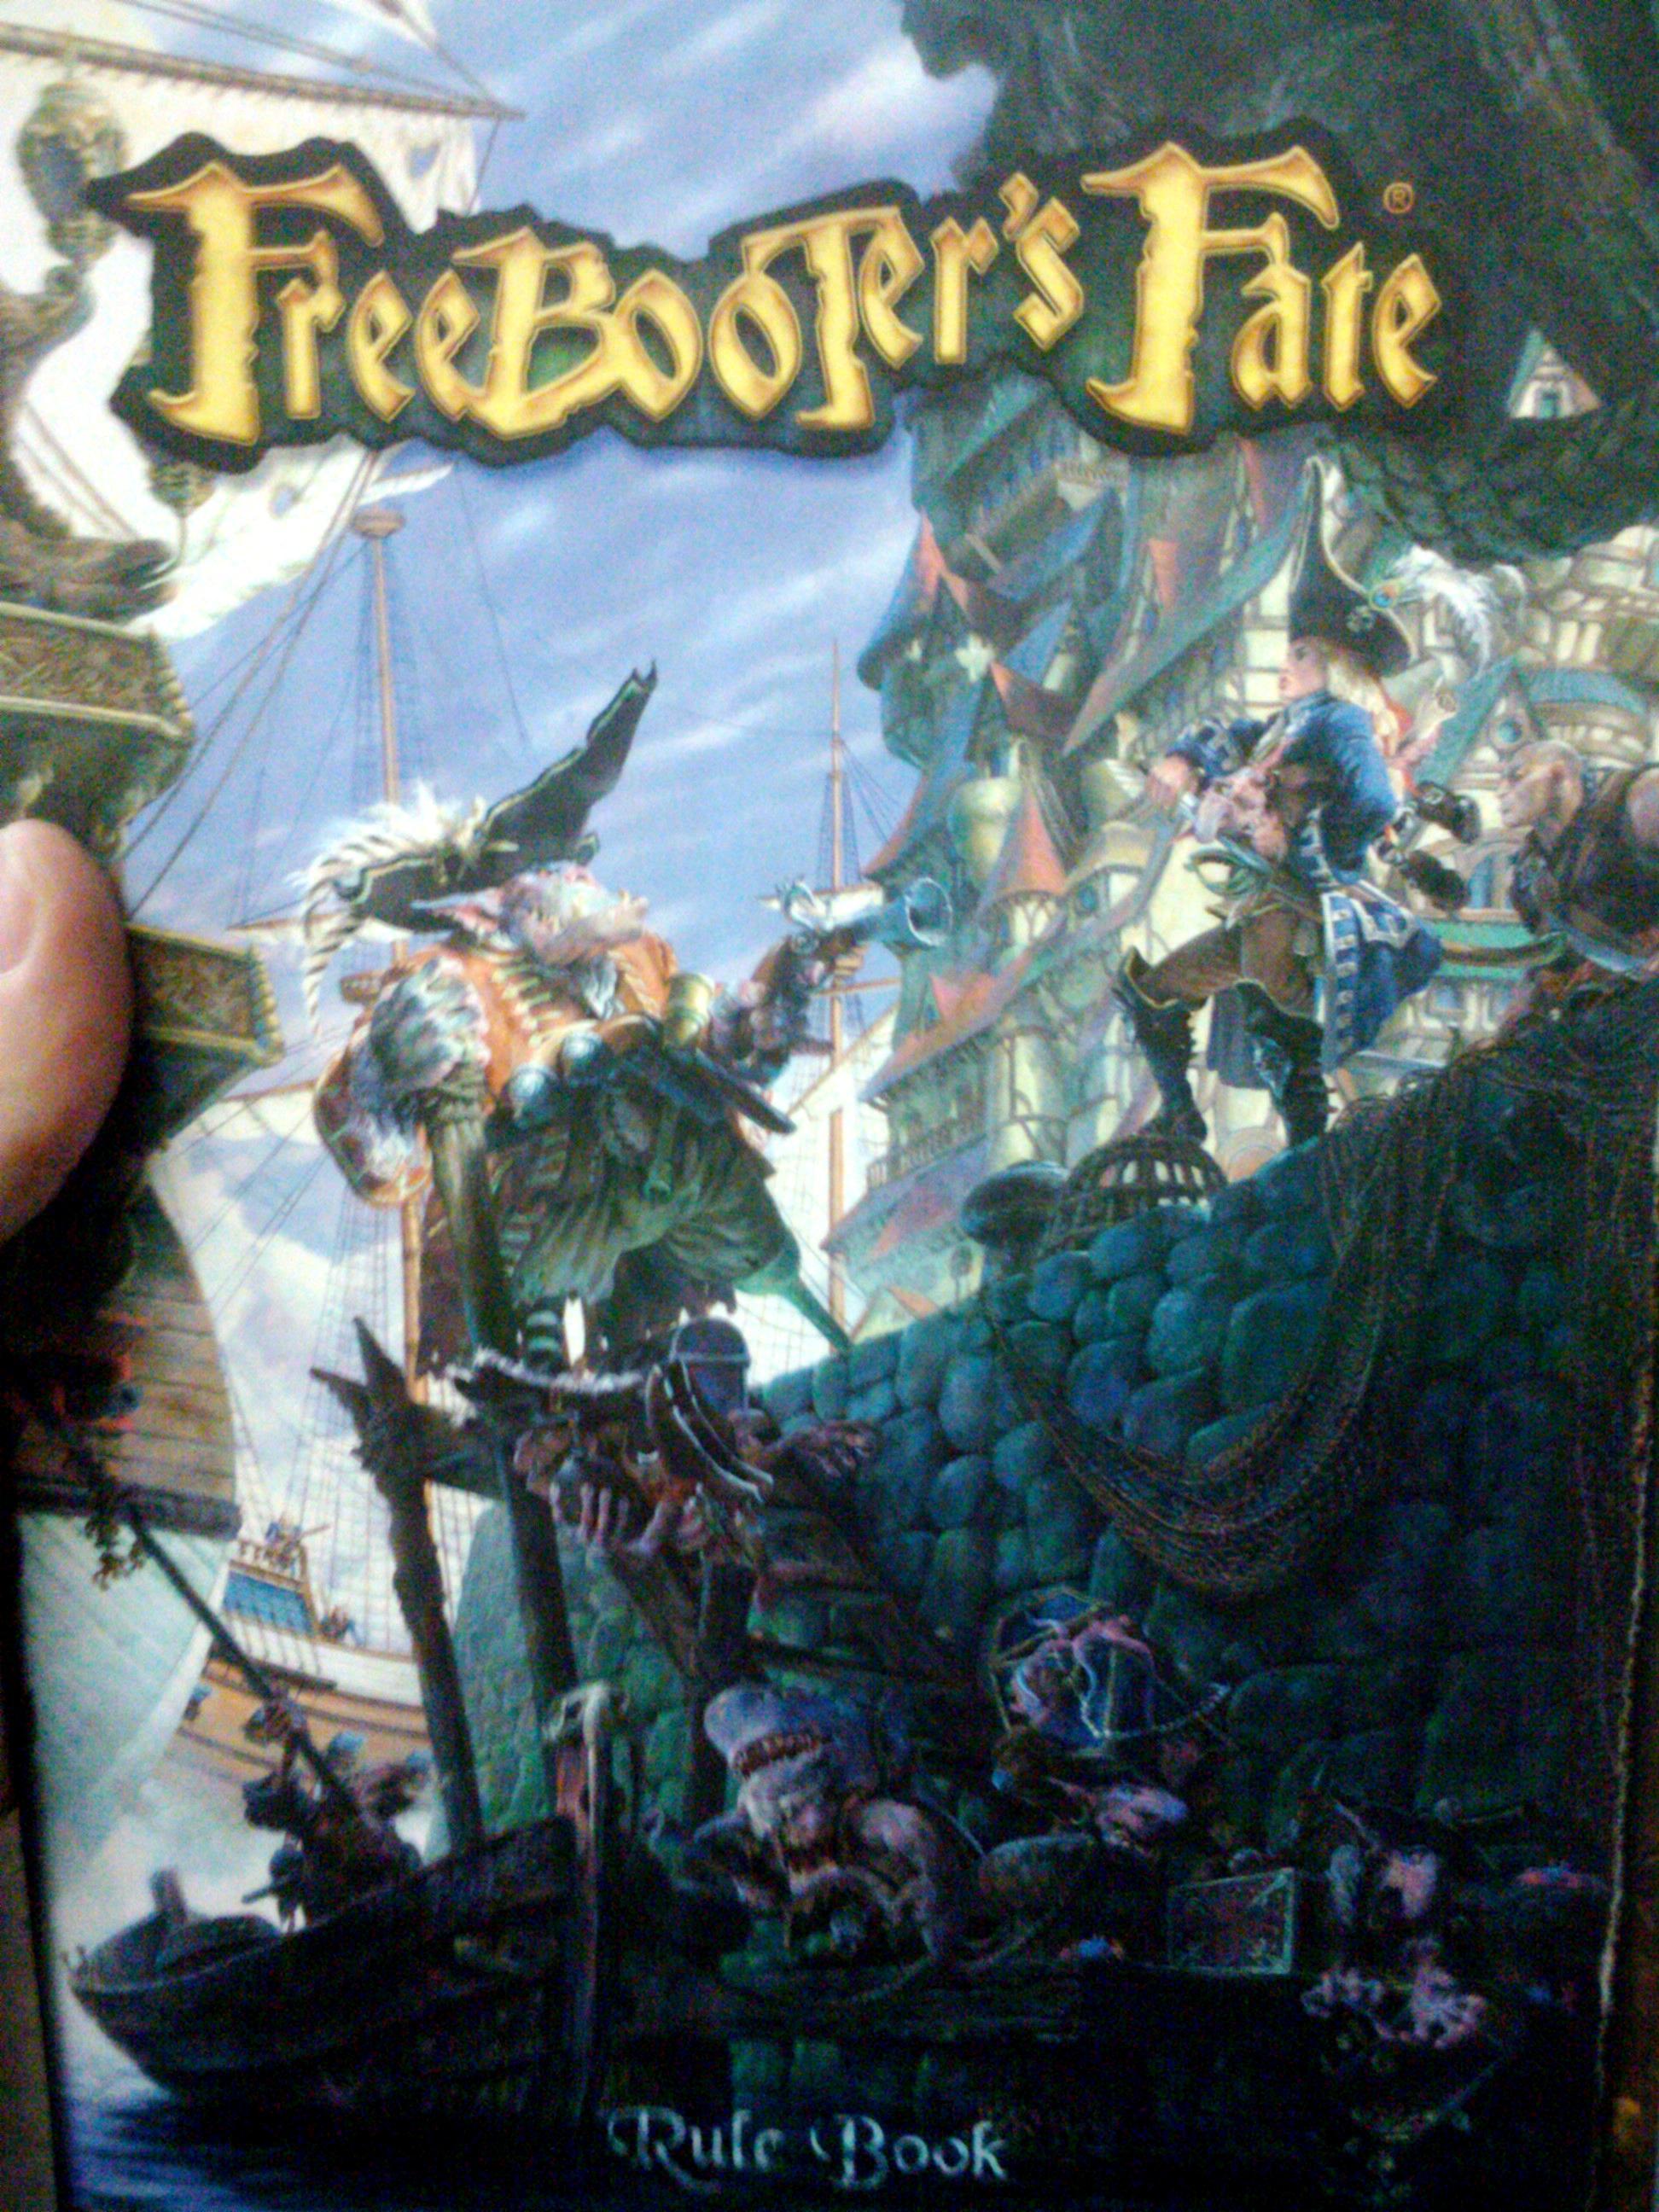 Build, Fate, Freebooter's, Freebooter's Fate, Freebooters, Freebooters Fate, Game, Goblin Pirates, Imperial, Painting, Pirate, Skirmish, The Brotherhood